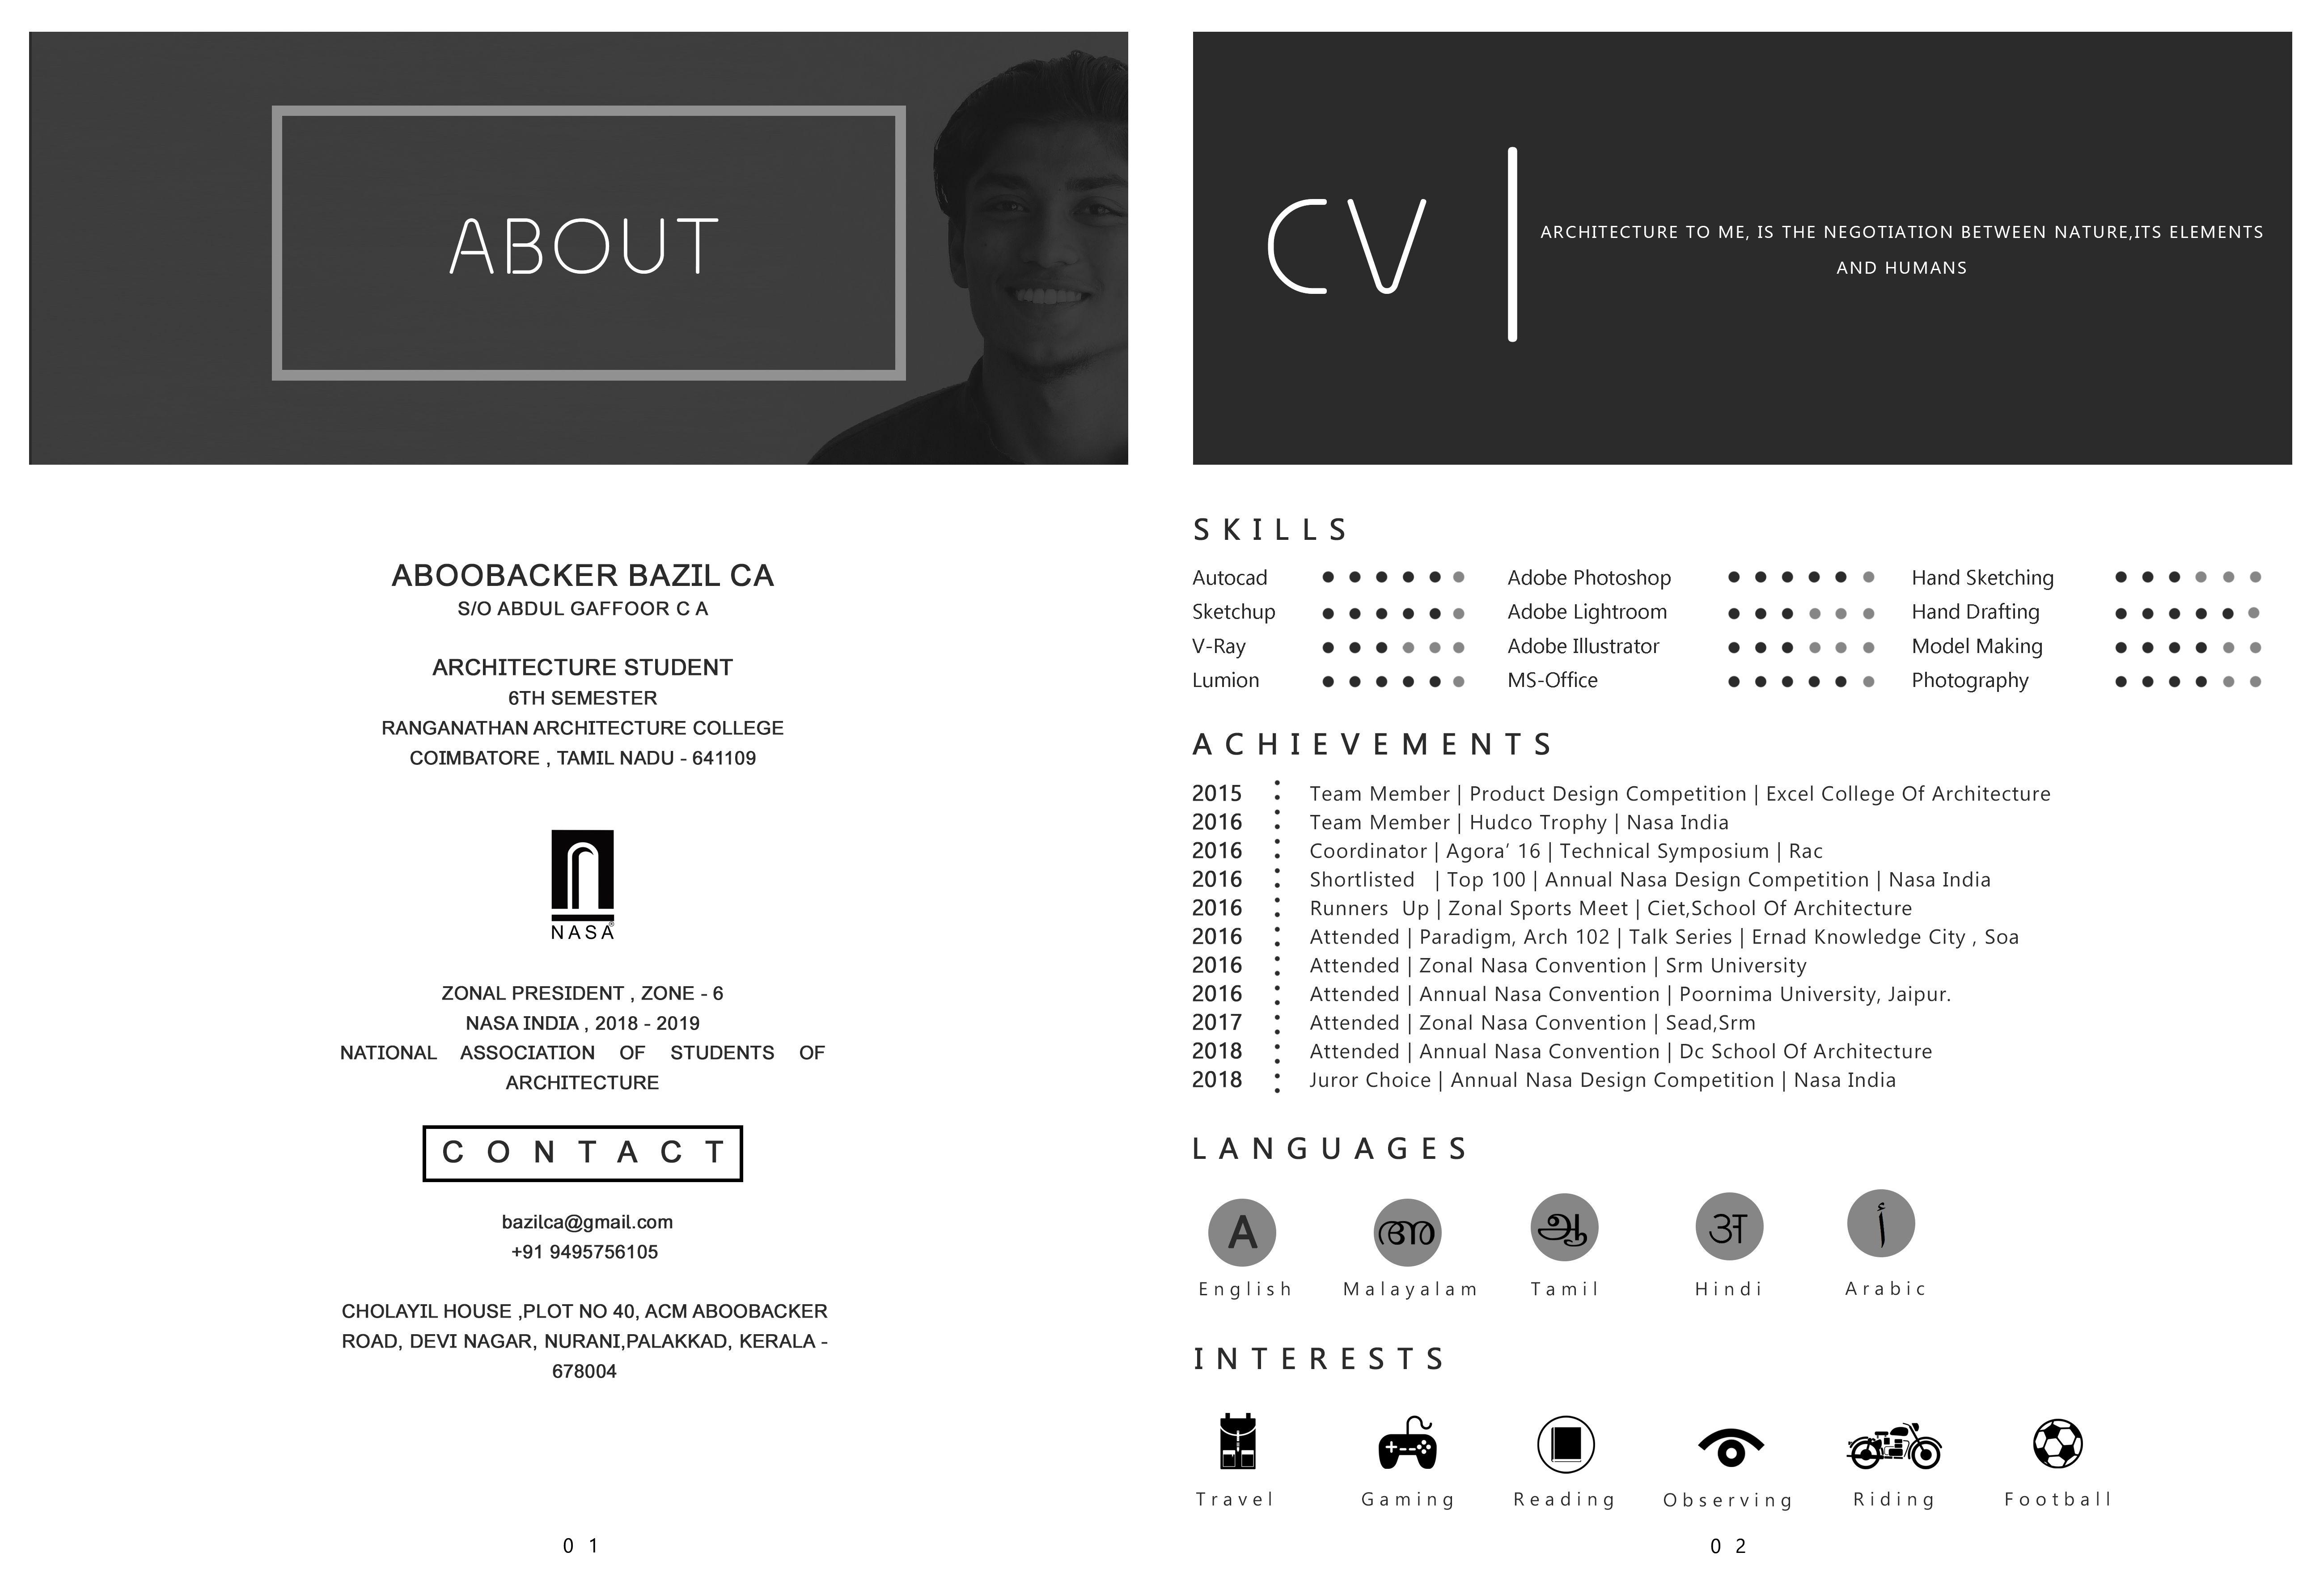 Aboobacker Bazil Ca Architecture Student Portfolio Architecture Resume Architecture Student Architecture Student Portfolio